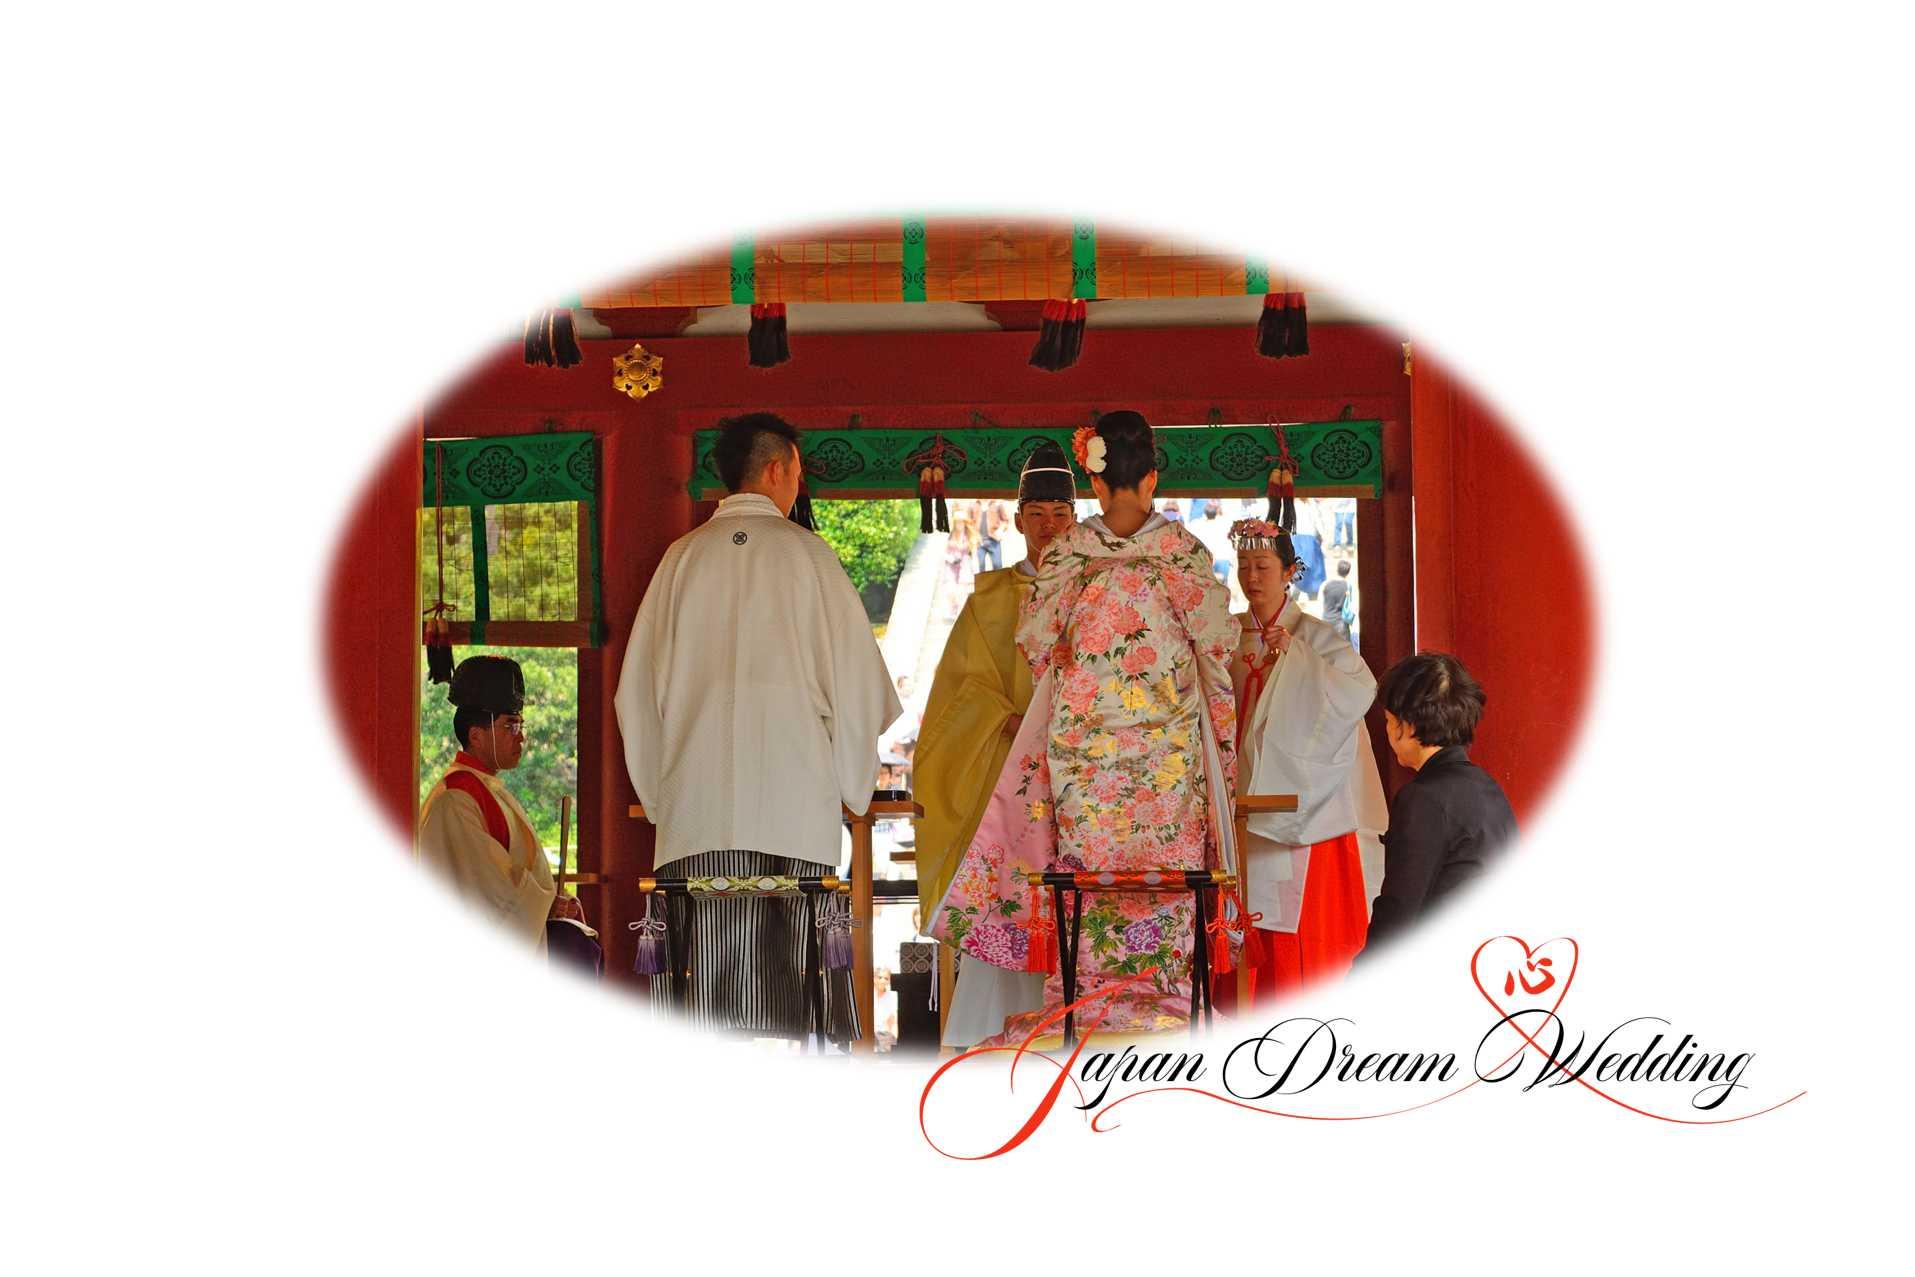 Japan Dream Wedding Shrine Venue